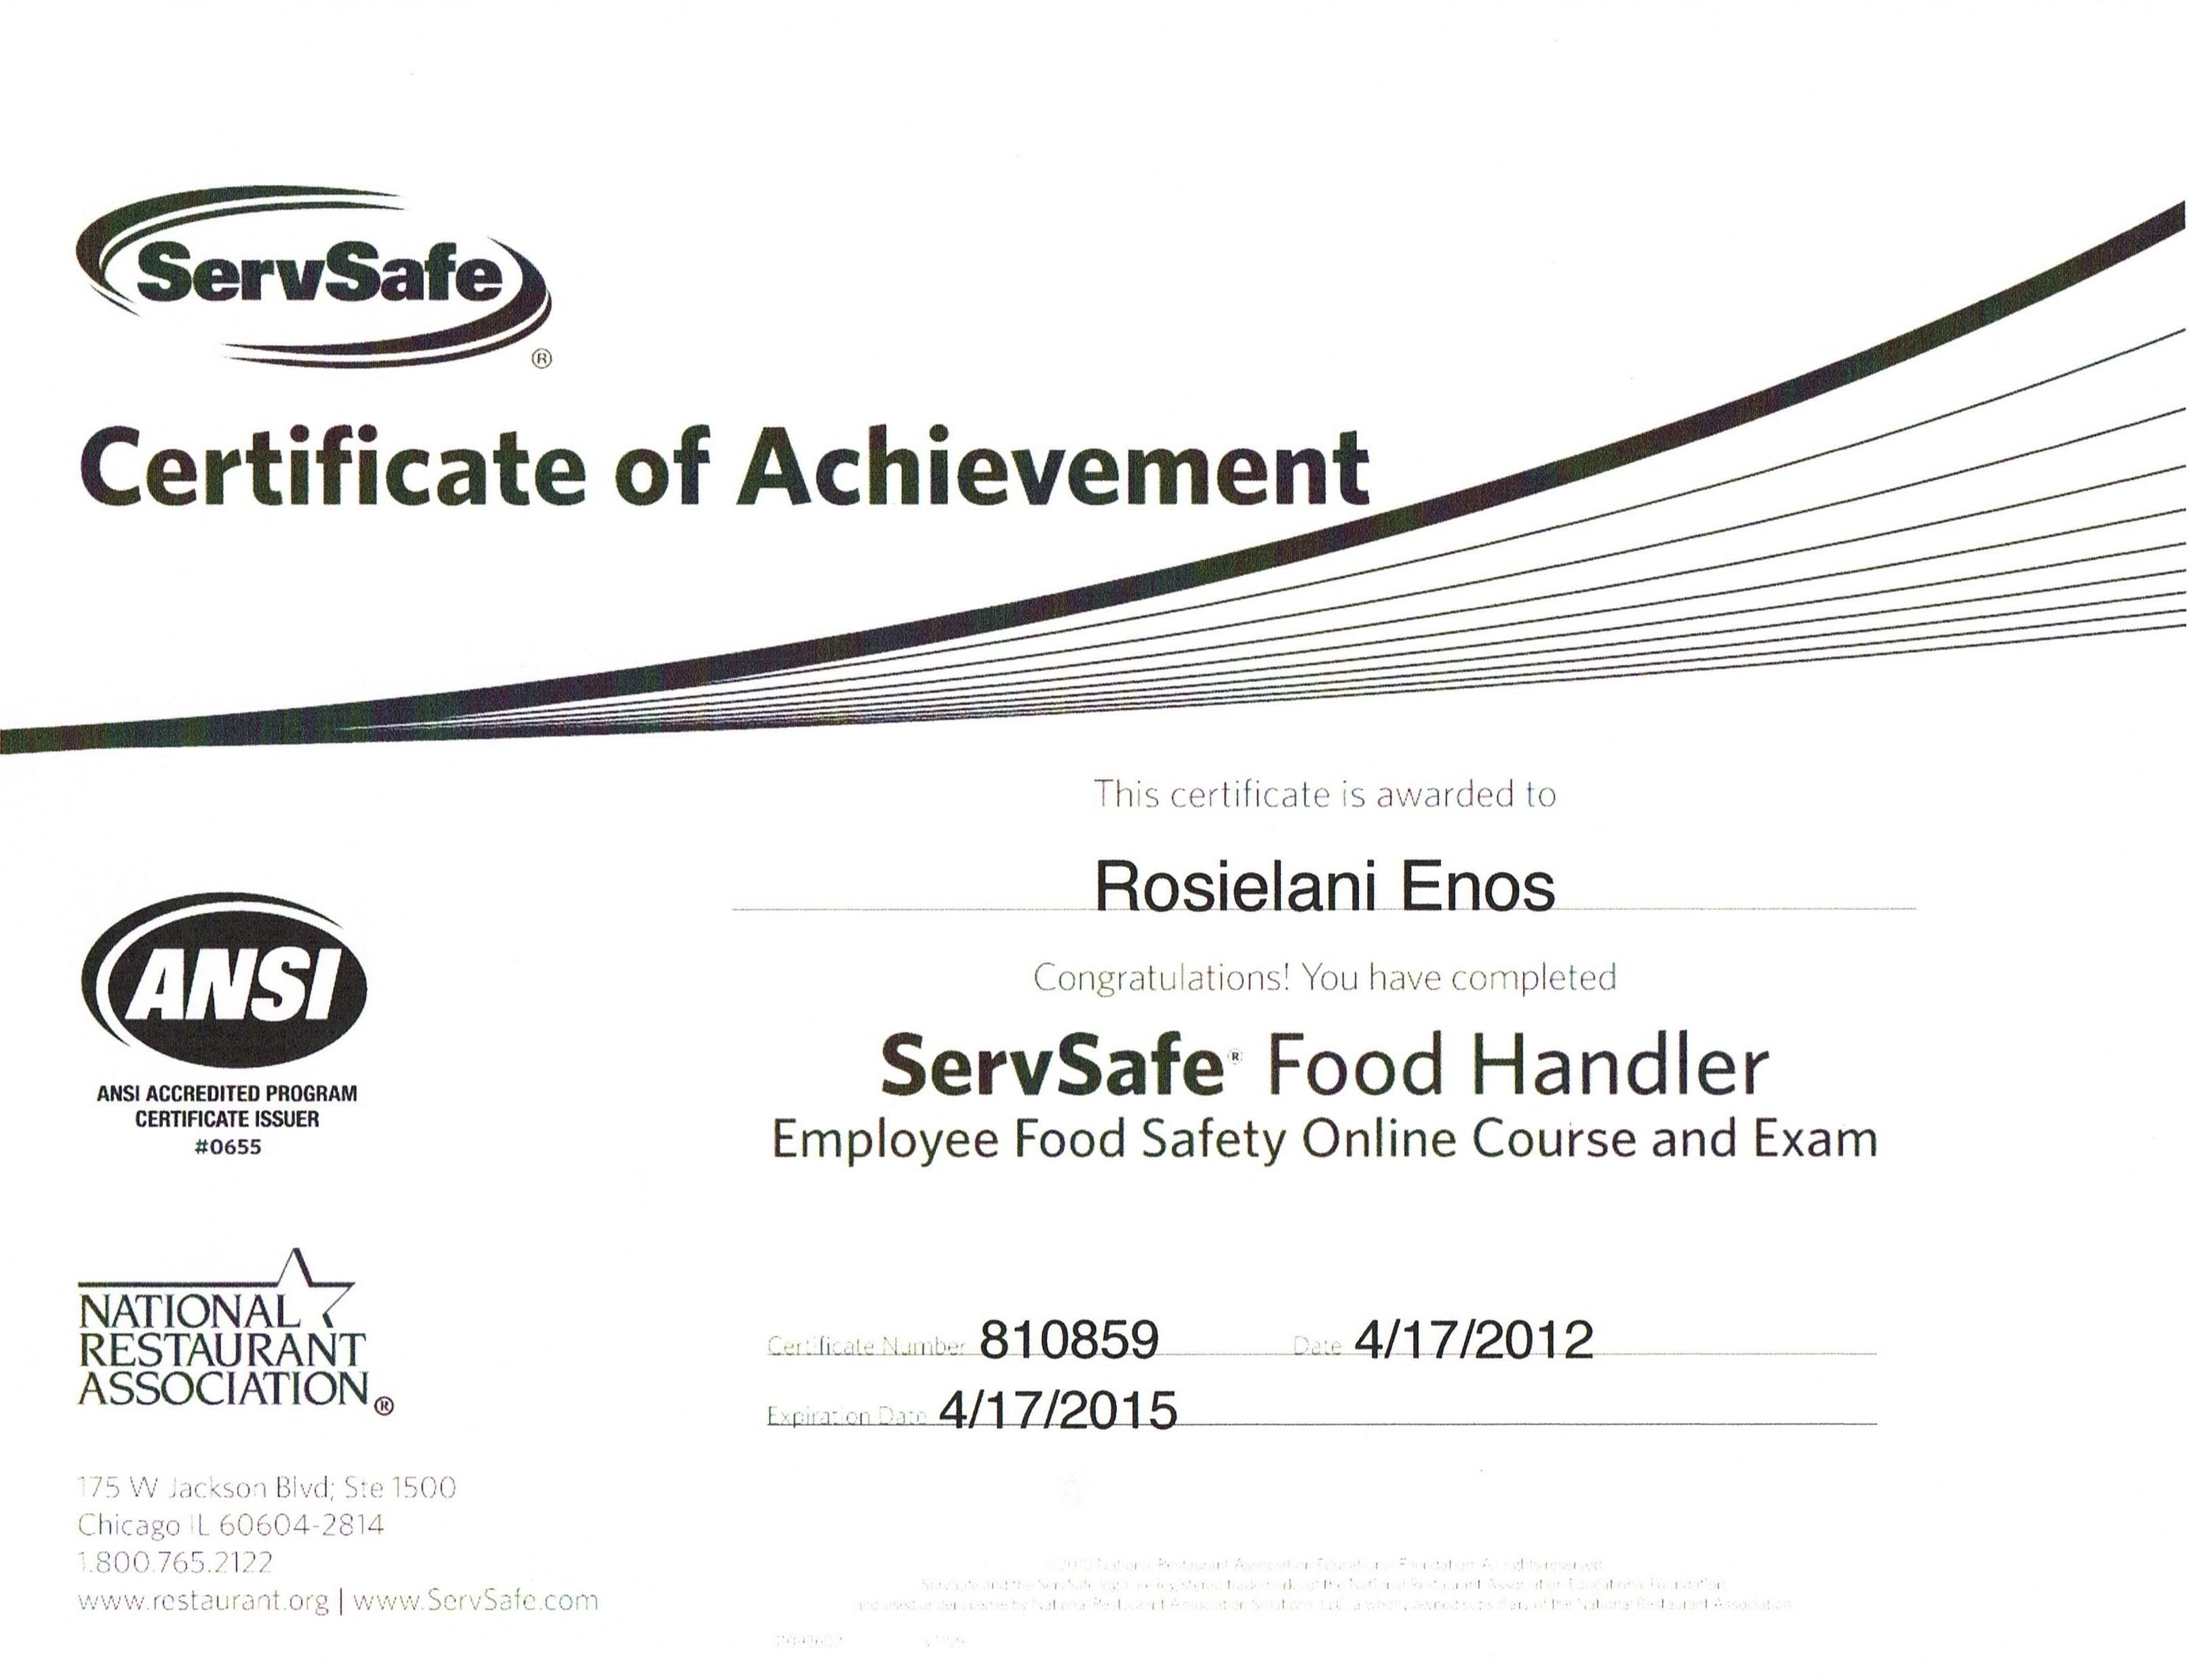 Servsafe Certificate Template